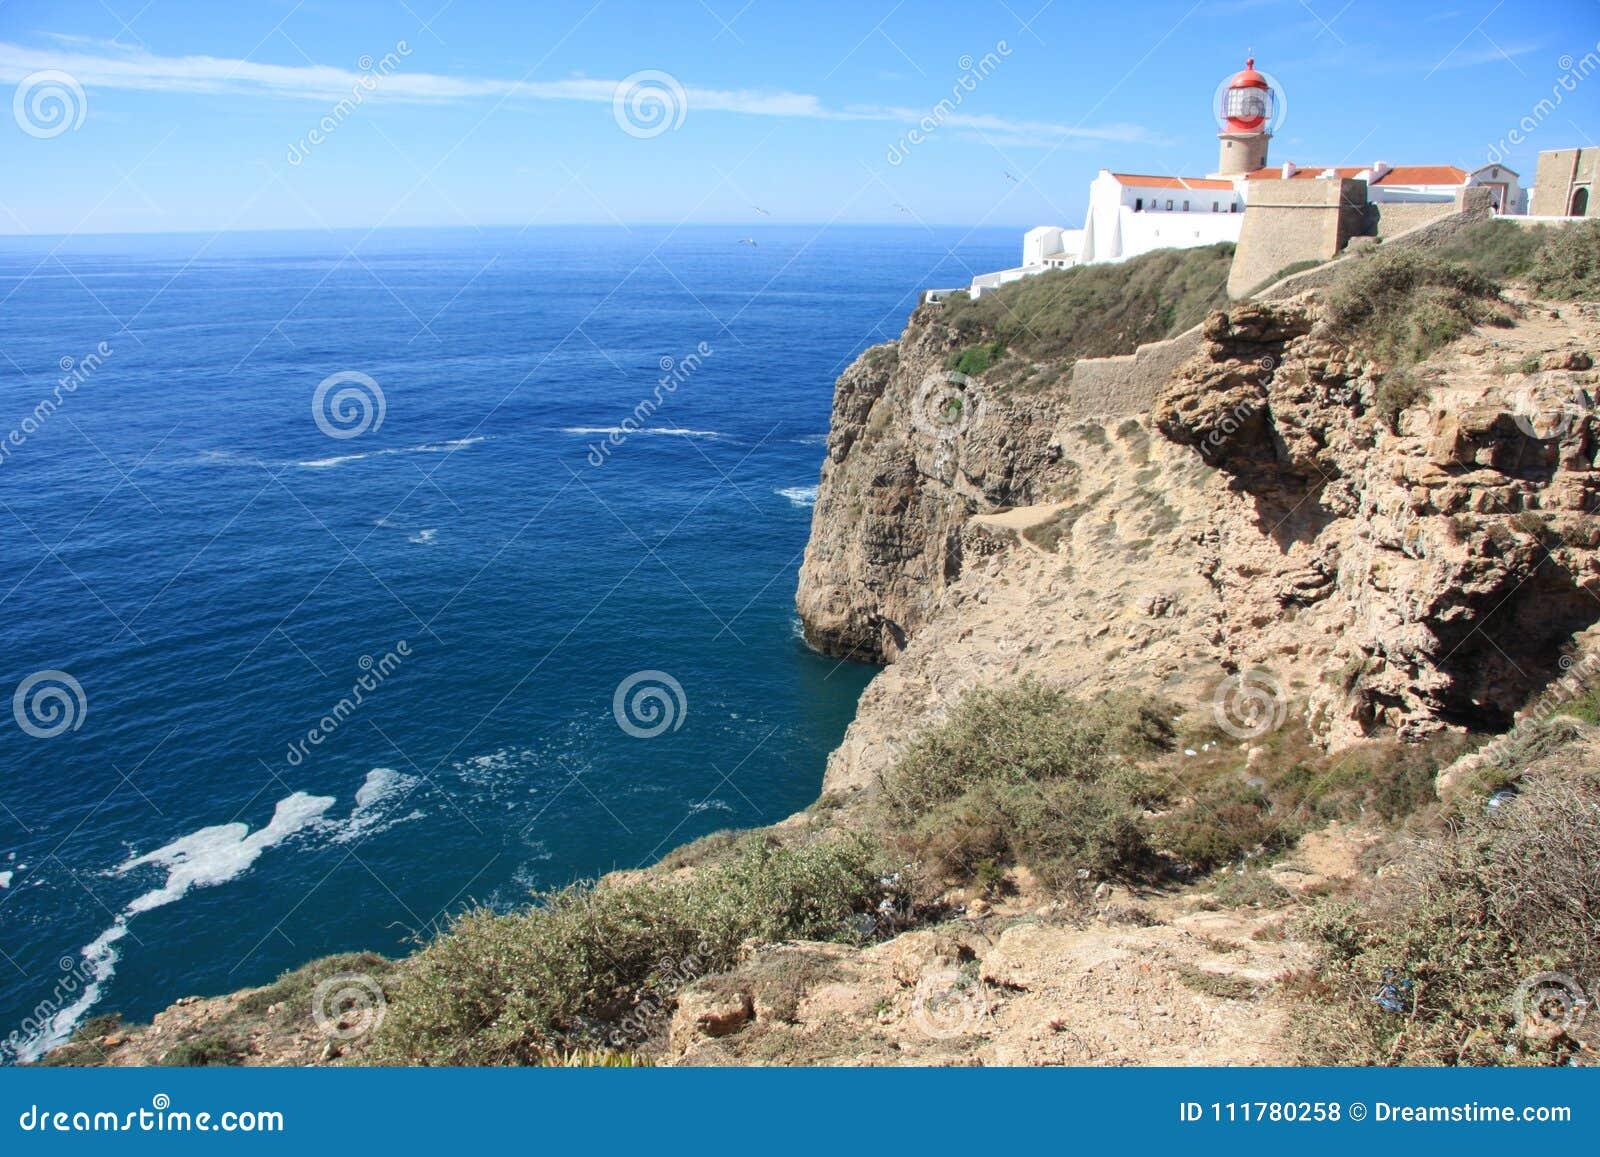 Lighthouse on Sagres cape, Faru, Portugal.